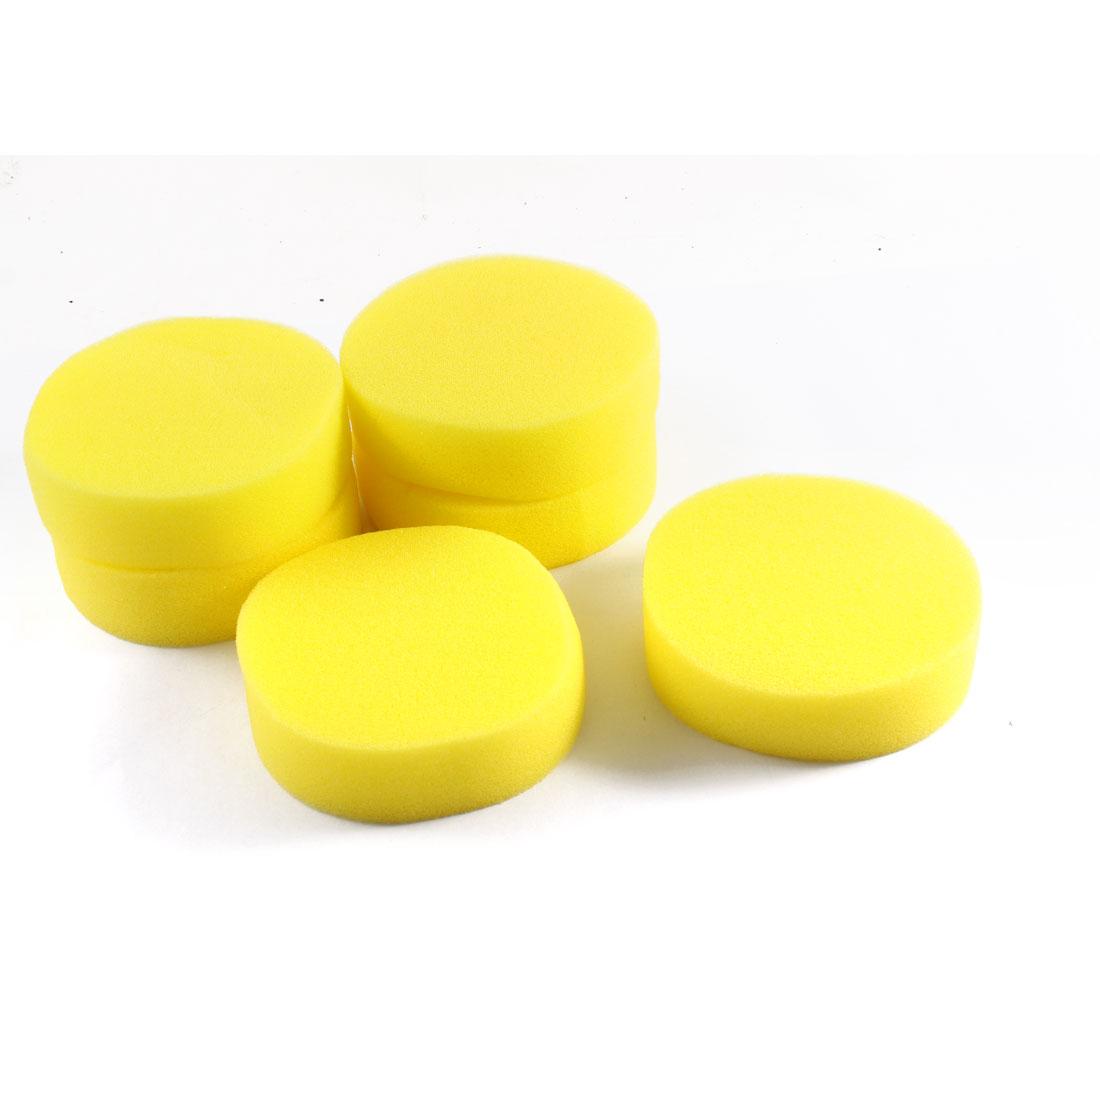 "6 Pcs 4"" Diameter Car Round Foam Cleaning Polishing Buffing Sponge Pad Yellow"